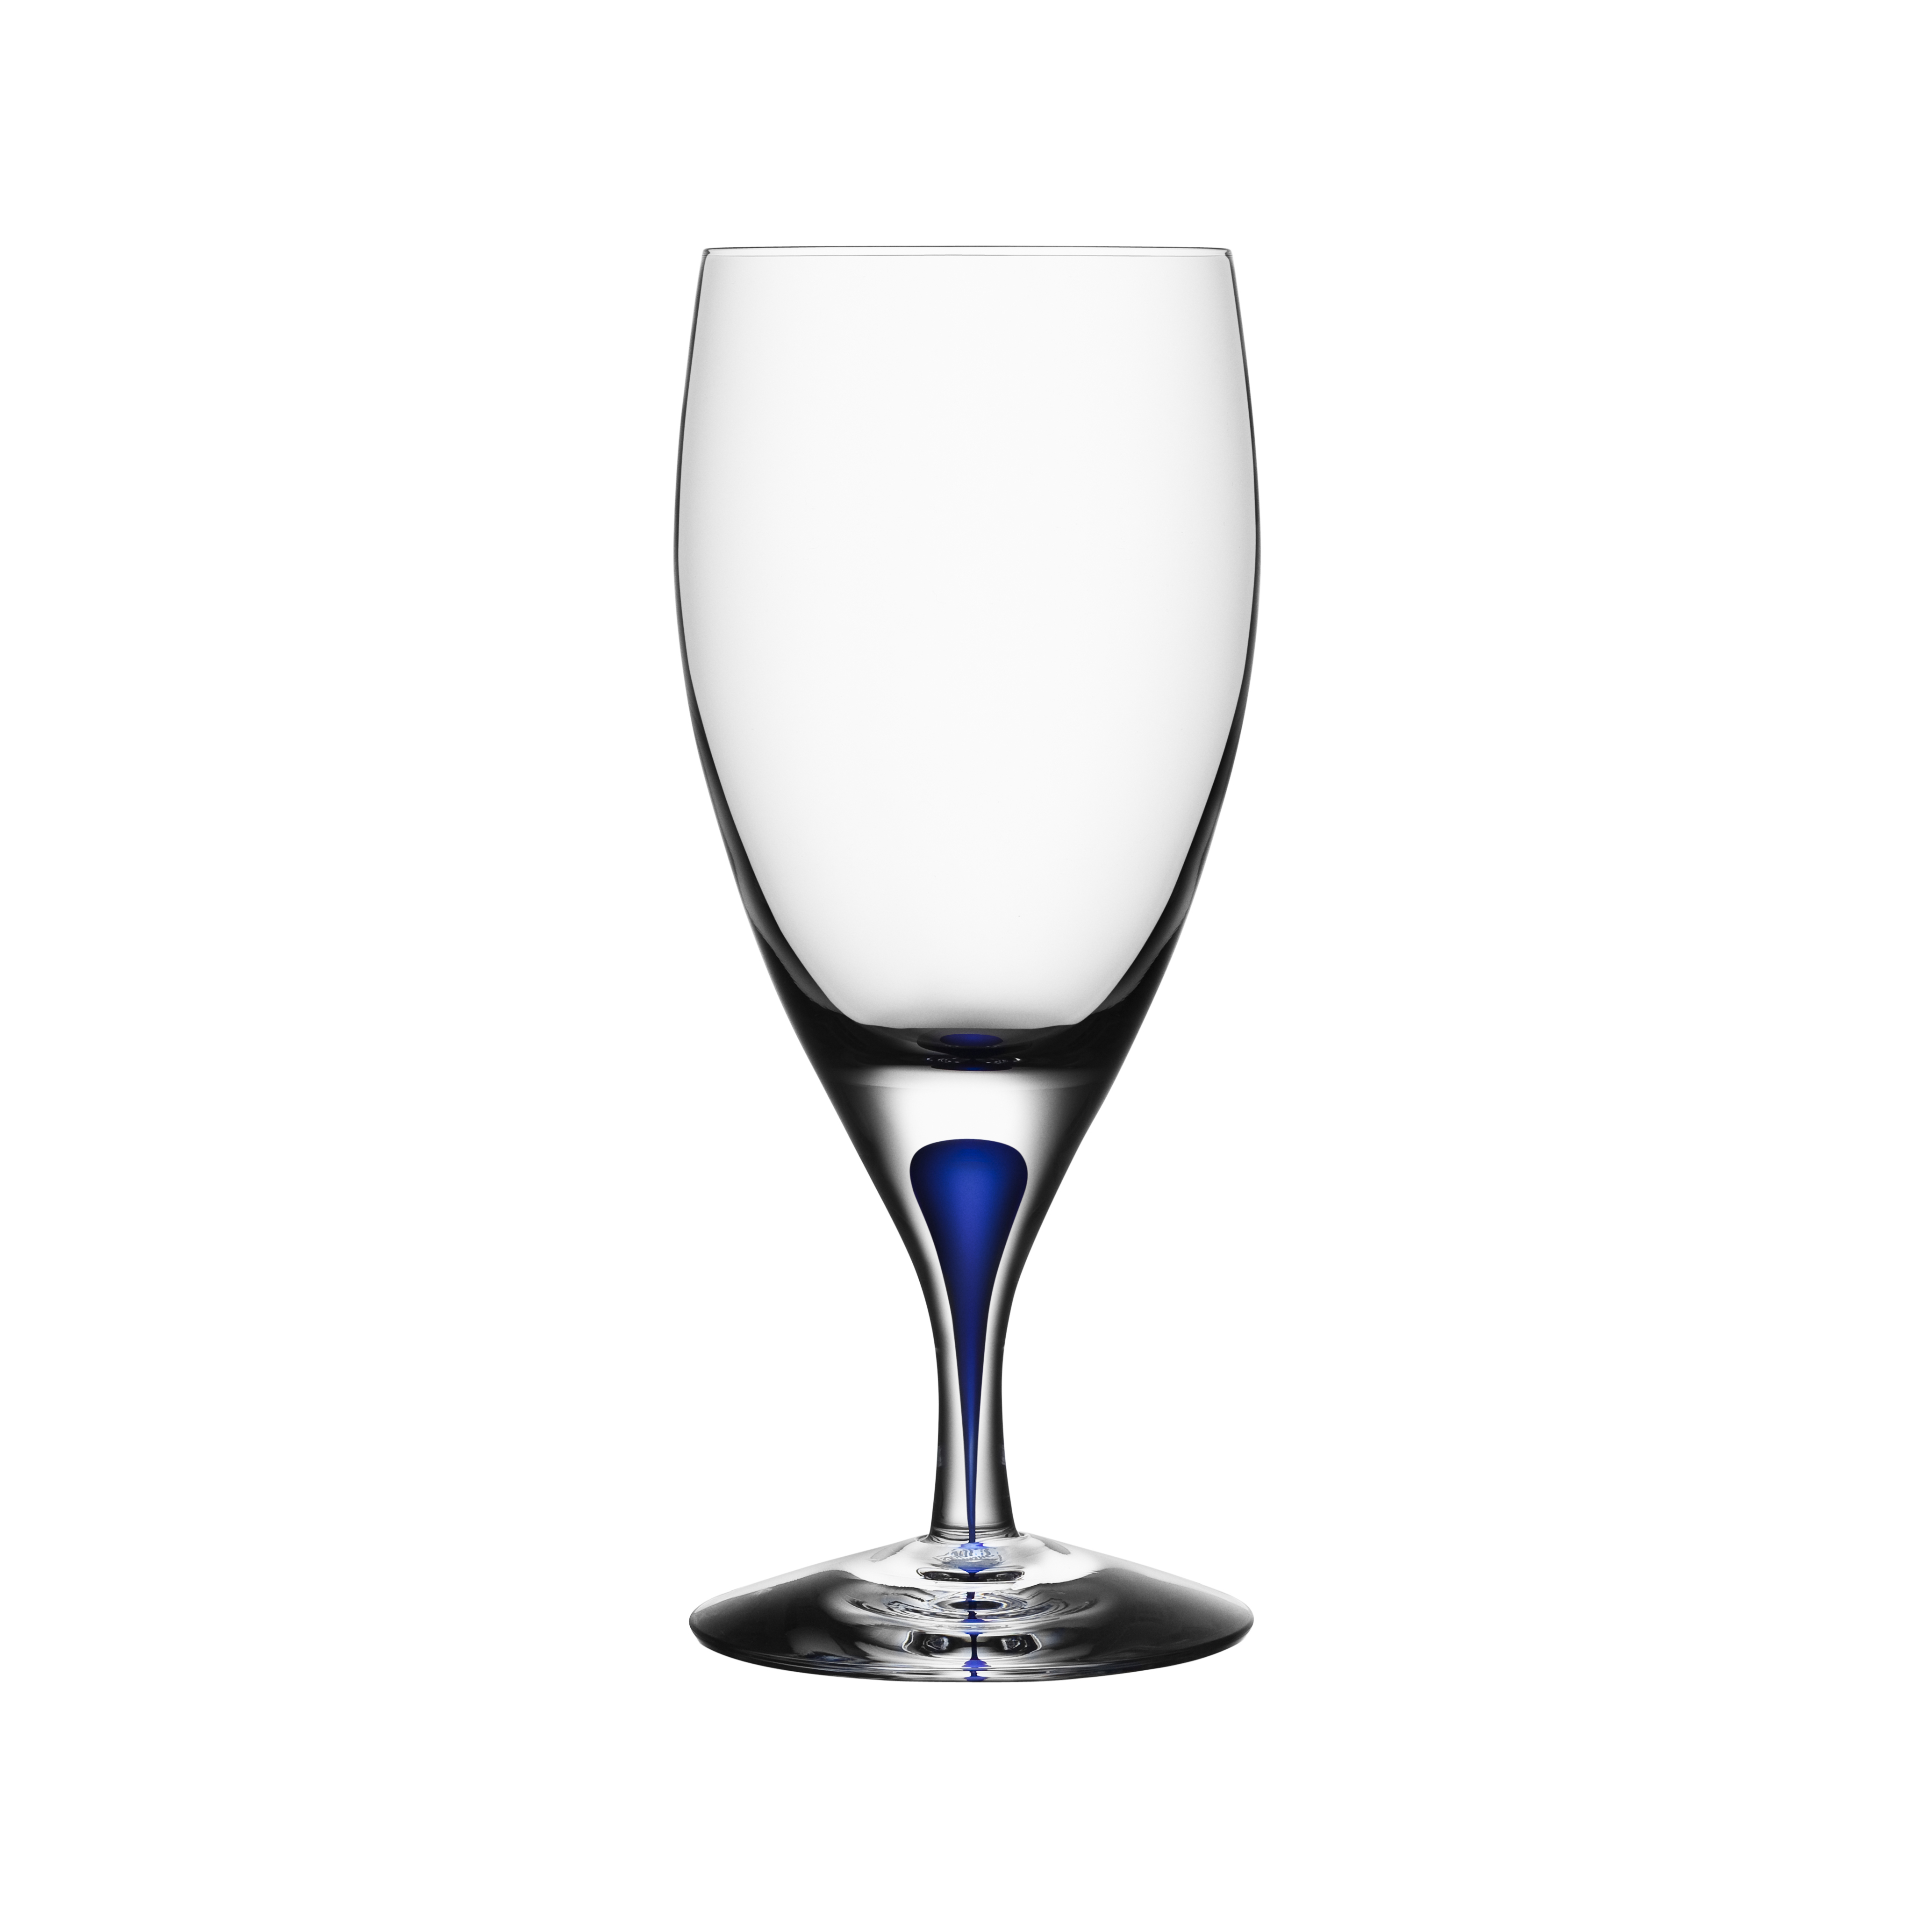 Intermezzo Blå Isvattenglas 47 cl